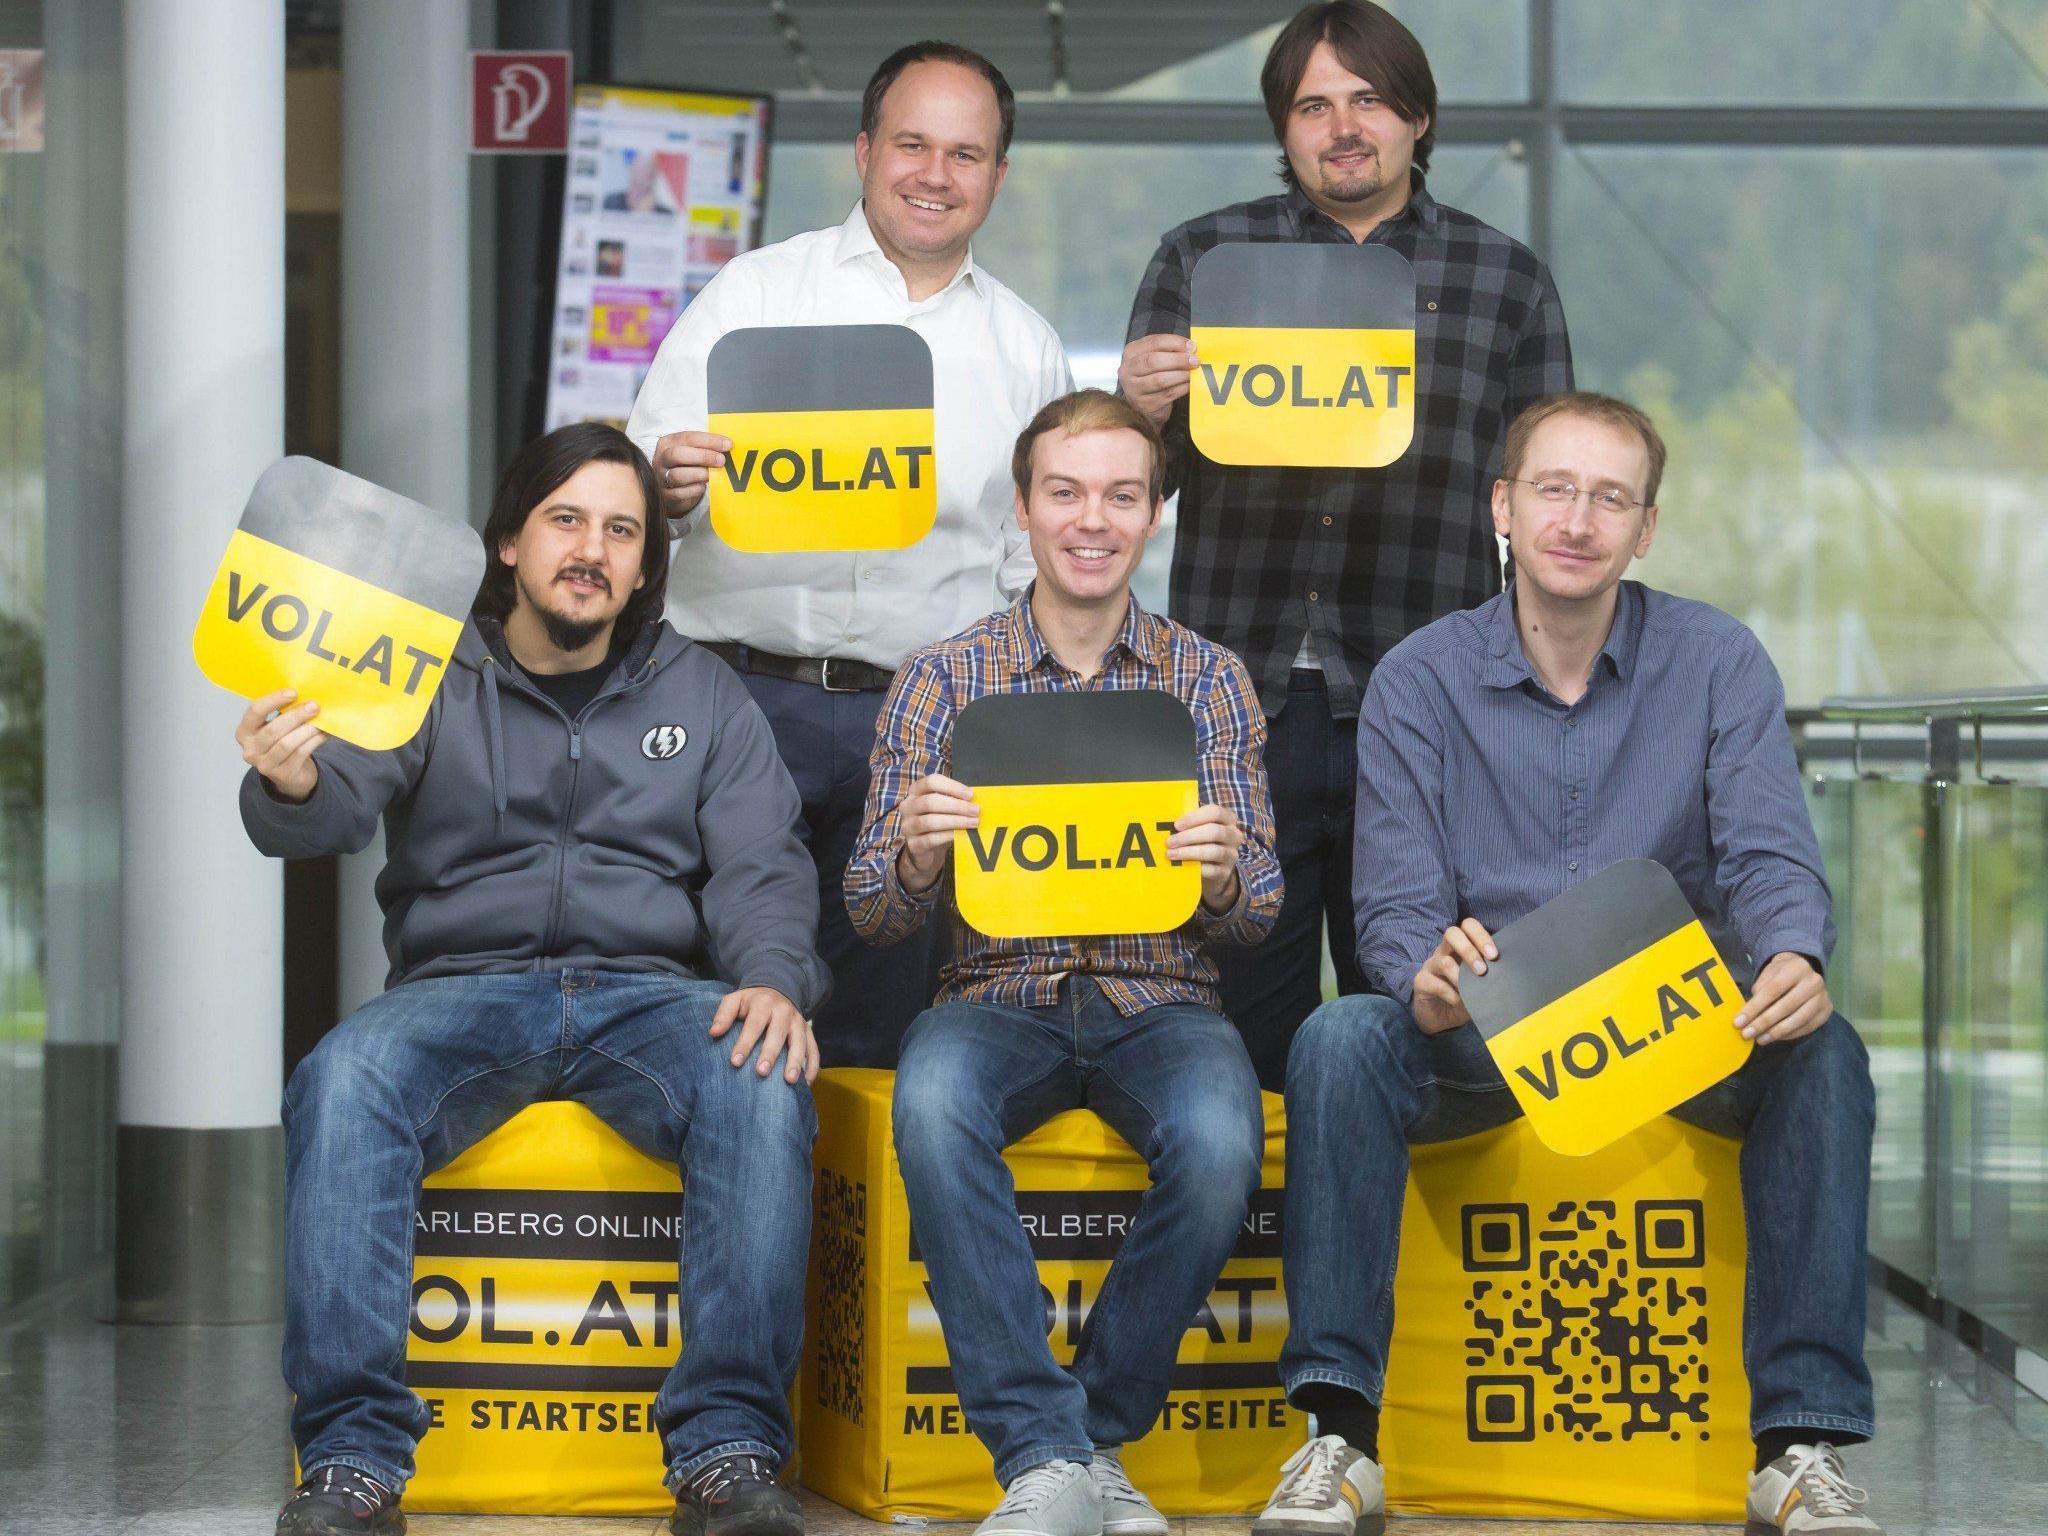 Das VOL.AT-Innovationsteam (hinten, v.l.n.r.: Russmedia Digital-CEO Gerold Riedmann, Dominic Depaoli (techn. Leitung). Vorne, v.l.n.r.: Nikolaus Schauersberger (Android-Entwicklung), Roland Fischl (iOS-Entwicklung), Martin Widmann (Leitung Innovationsteam).